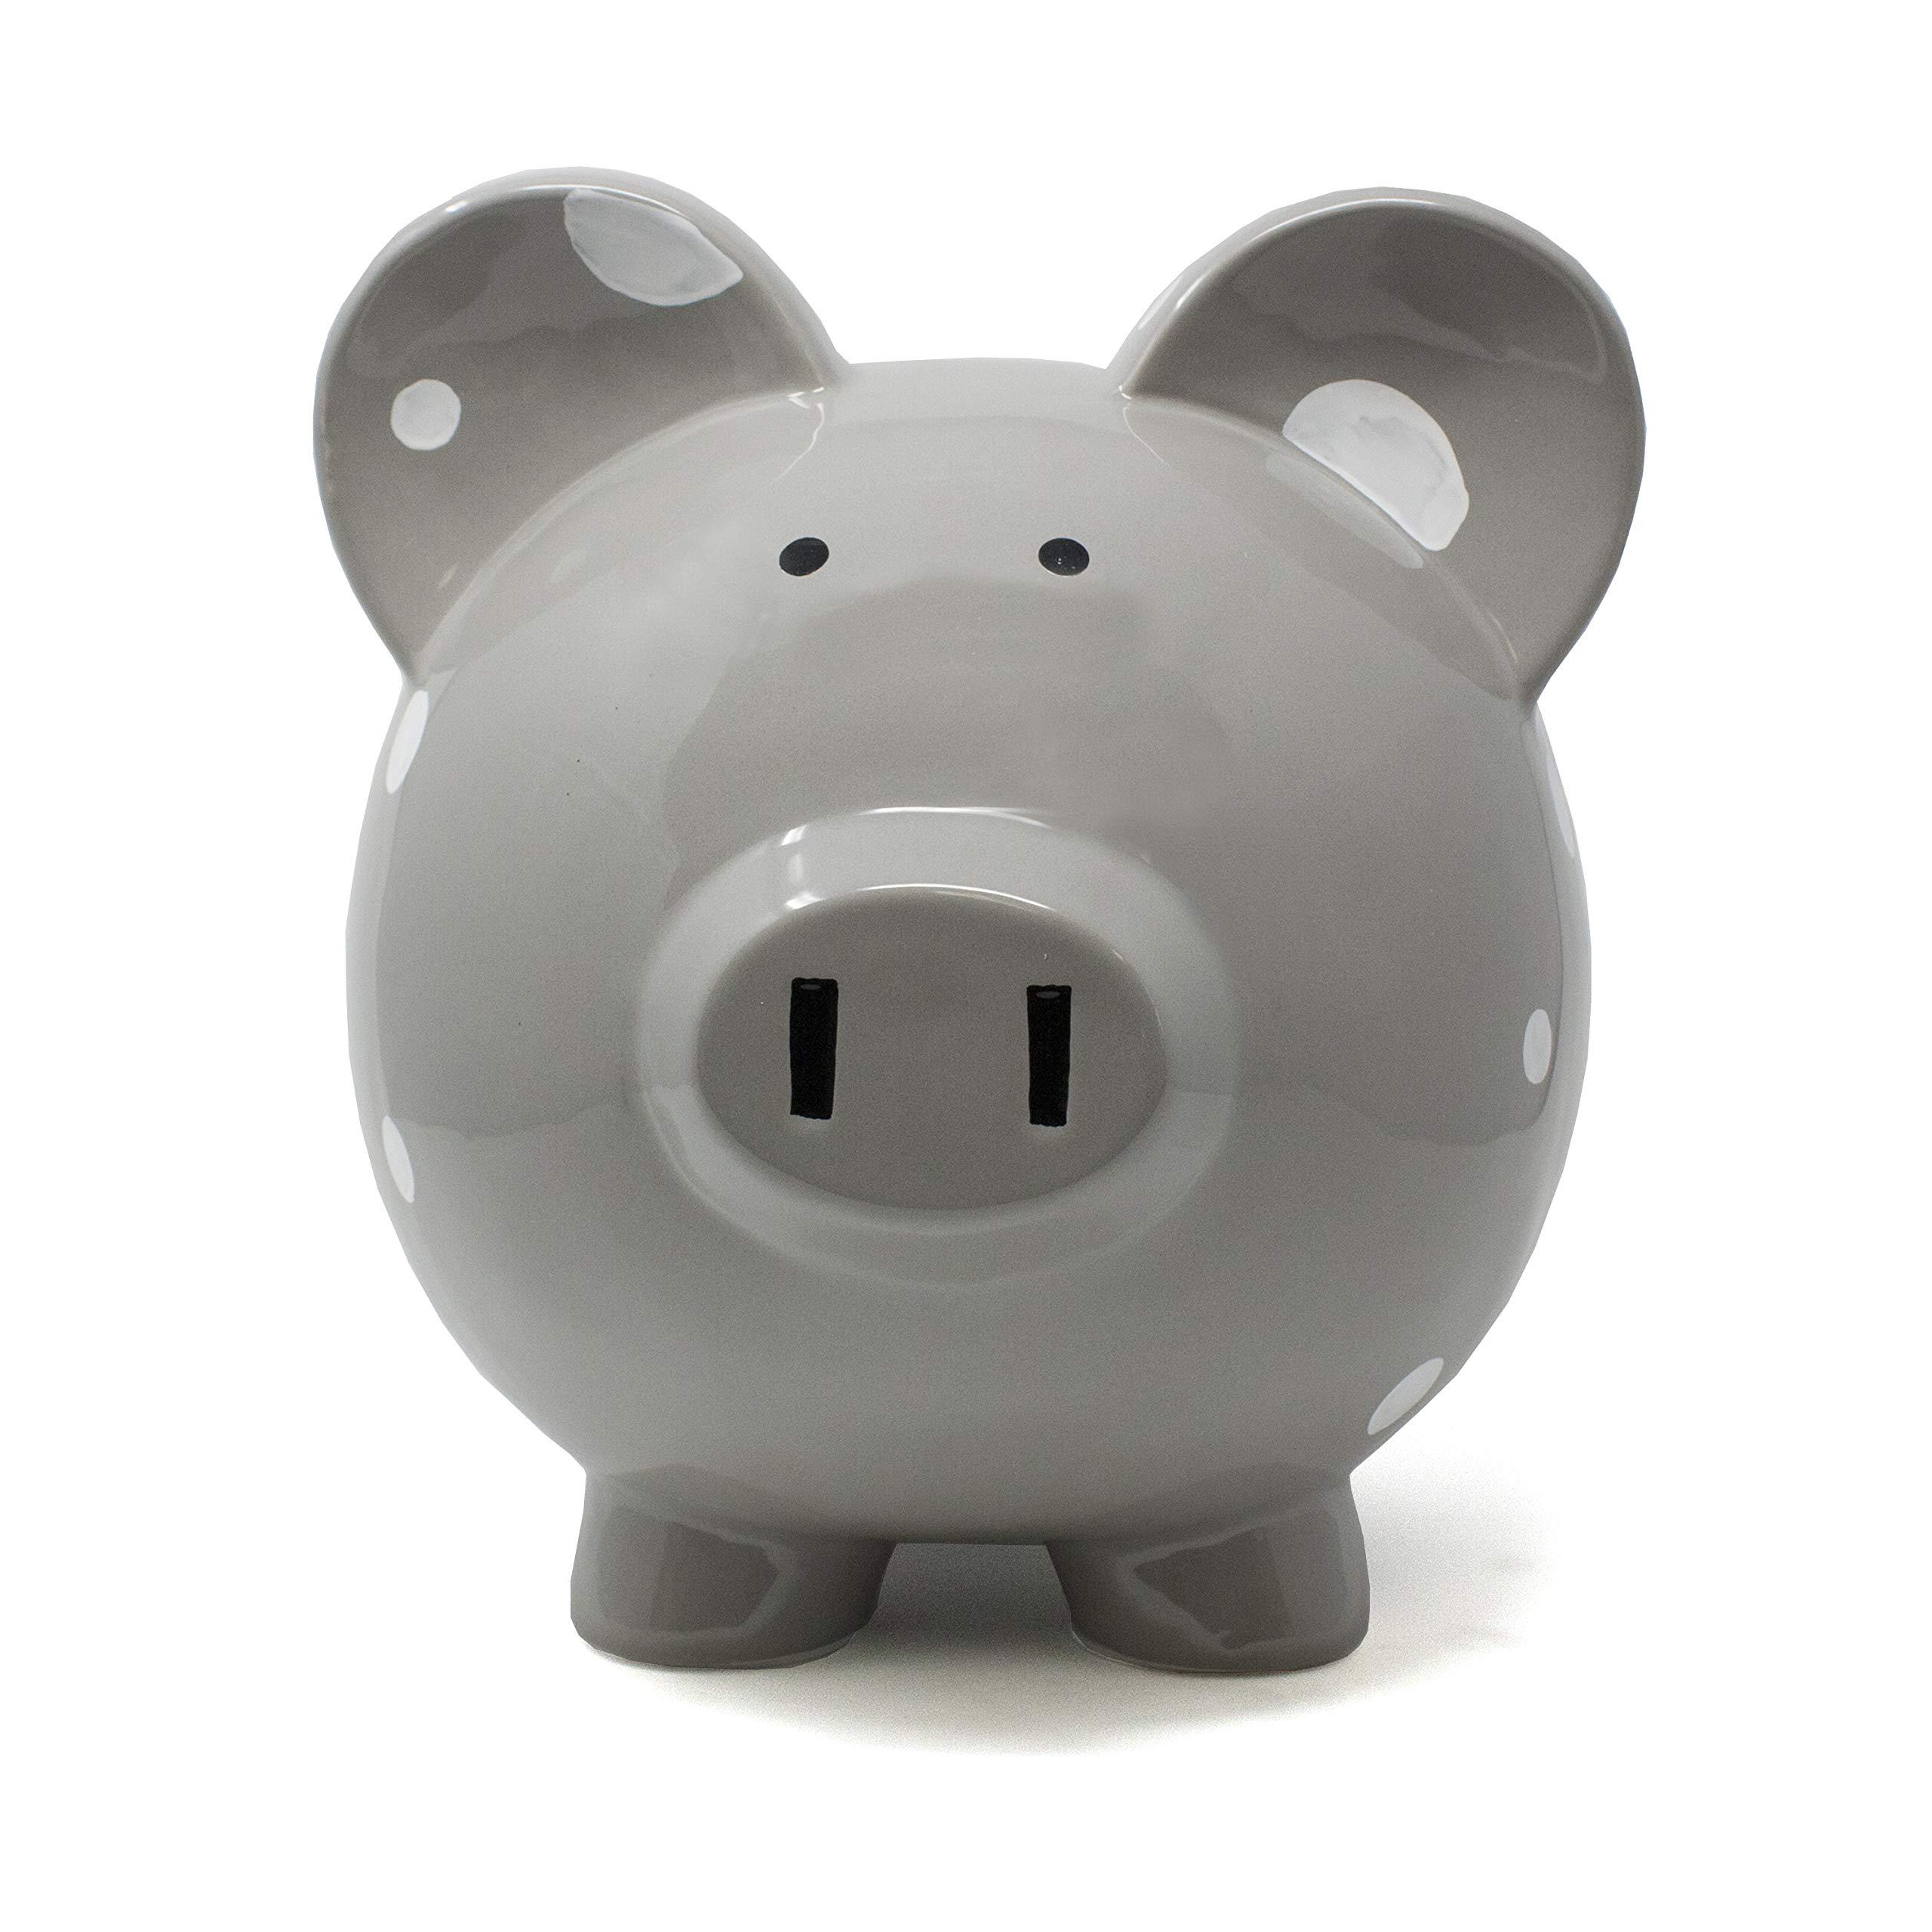 Child to Cherish Large Ceramic Boss Piggy Bank, Gray Polka Dot by Child to Cherish (Image #5)